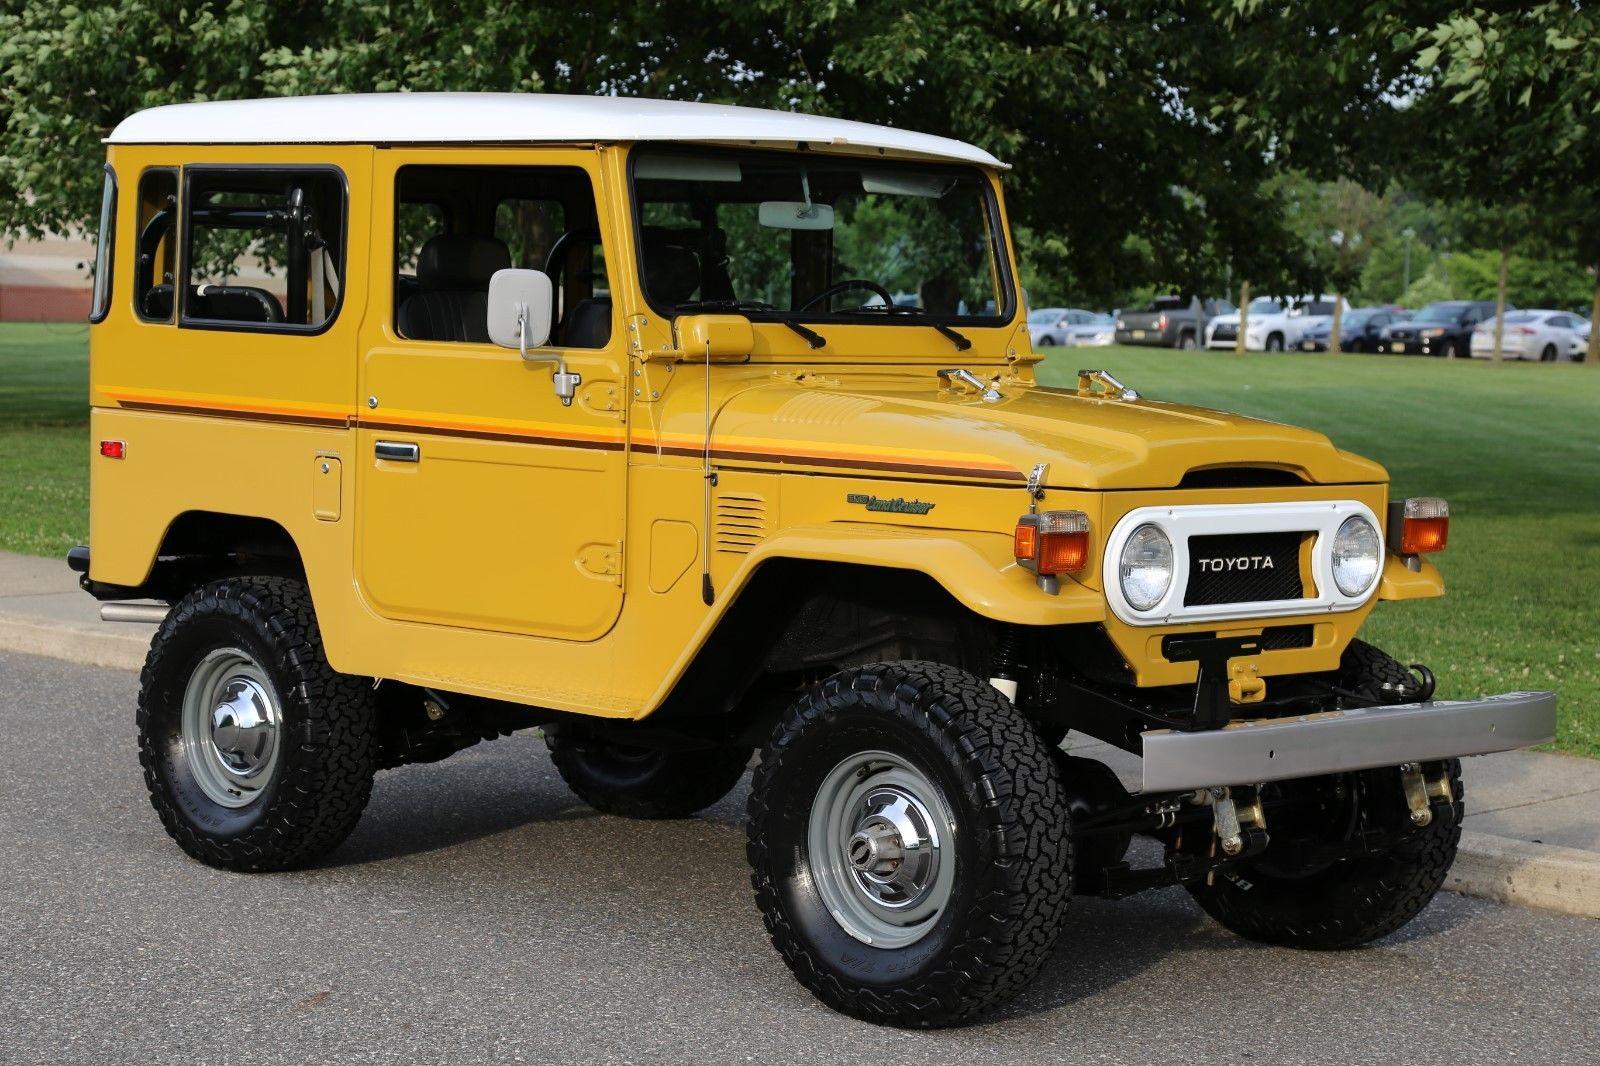 For Sale - 1978 FJ40 On Ebay Warning | IH8MUD Forum